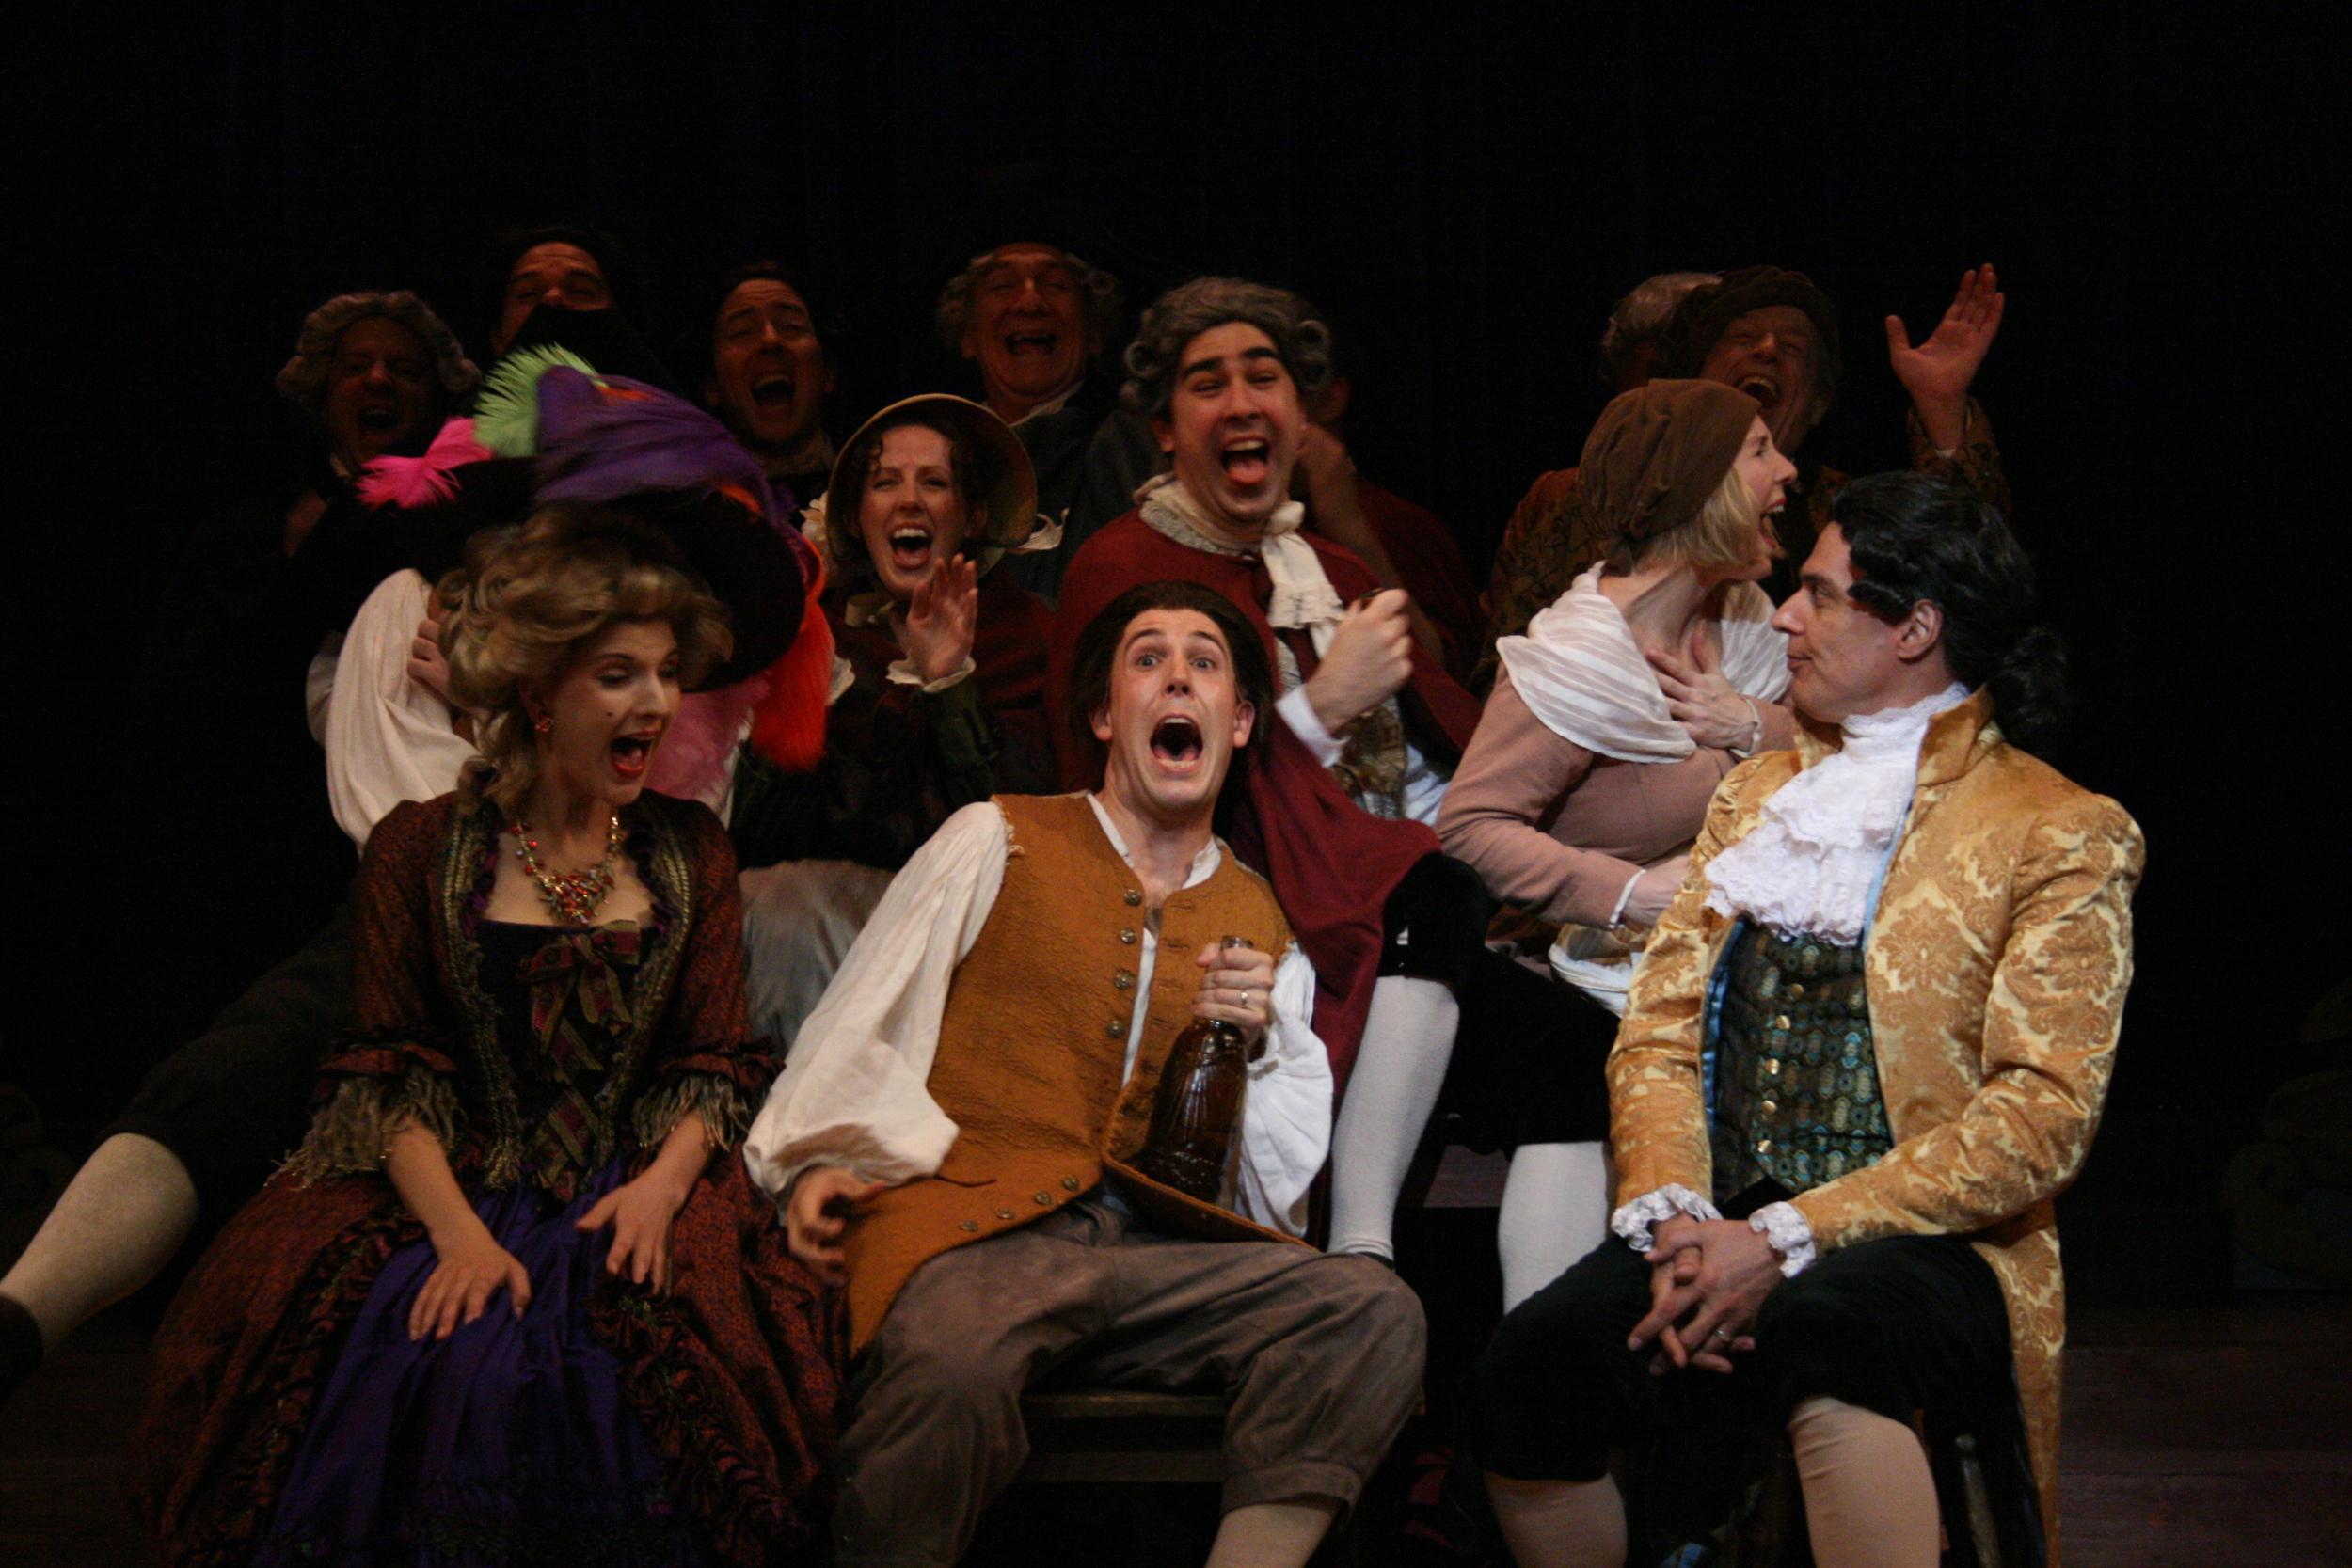 Amadeus - Front Row - Katherina Cavalieri (Katie Fabel), Mozart (Jordan Coughtry), Salieri (Robert Cuccioli) and Ensemble.jpg